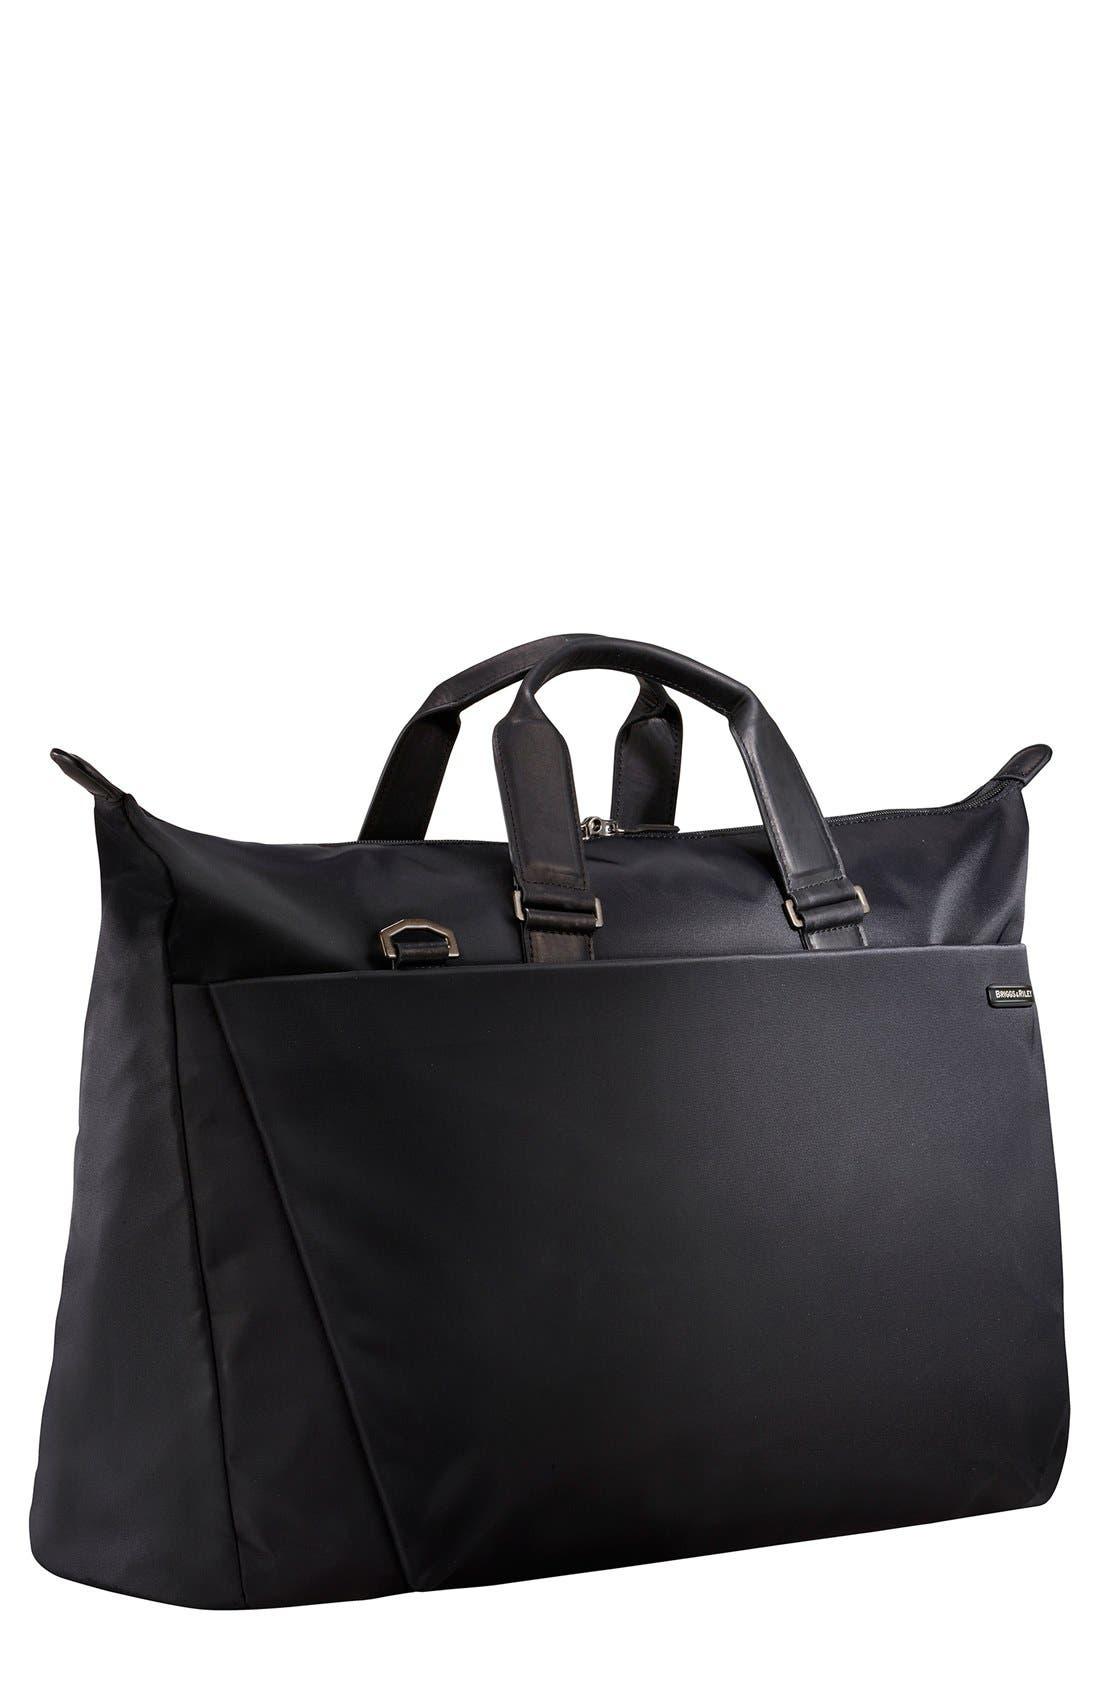 BRIGGS & RILEY Sympatico Duffel Bag